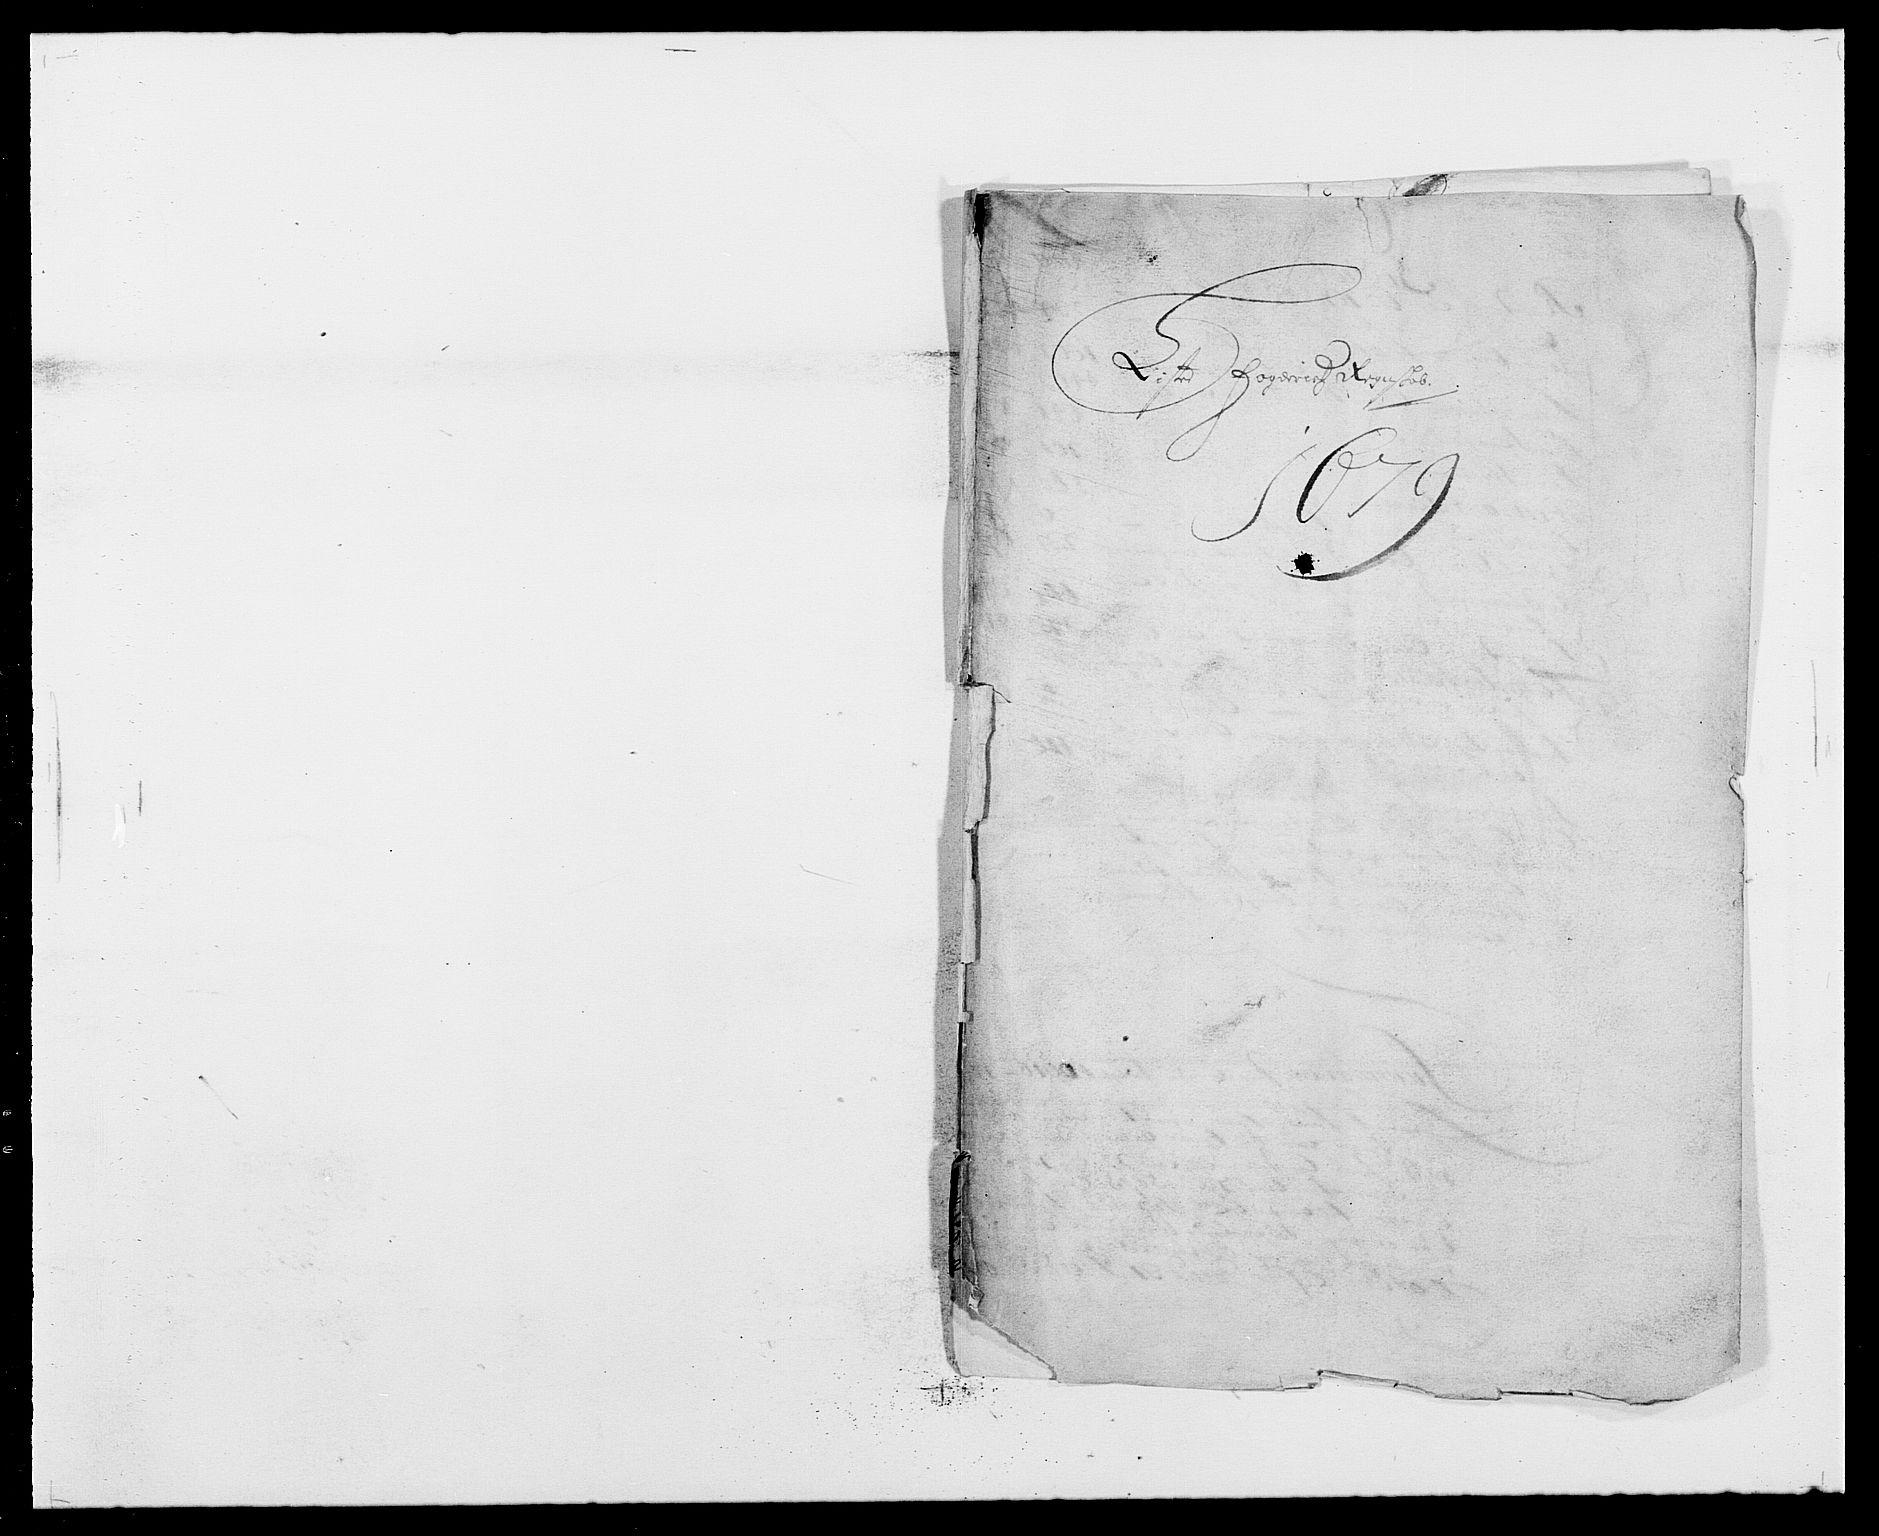 RA, Rentekammeret inntil 1814, Reviderte regnskaper, Fogderegnskap, R41/L2530: Fogderegnskap Lista, 1677-1679, s. 301